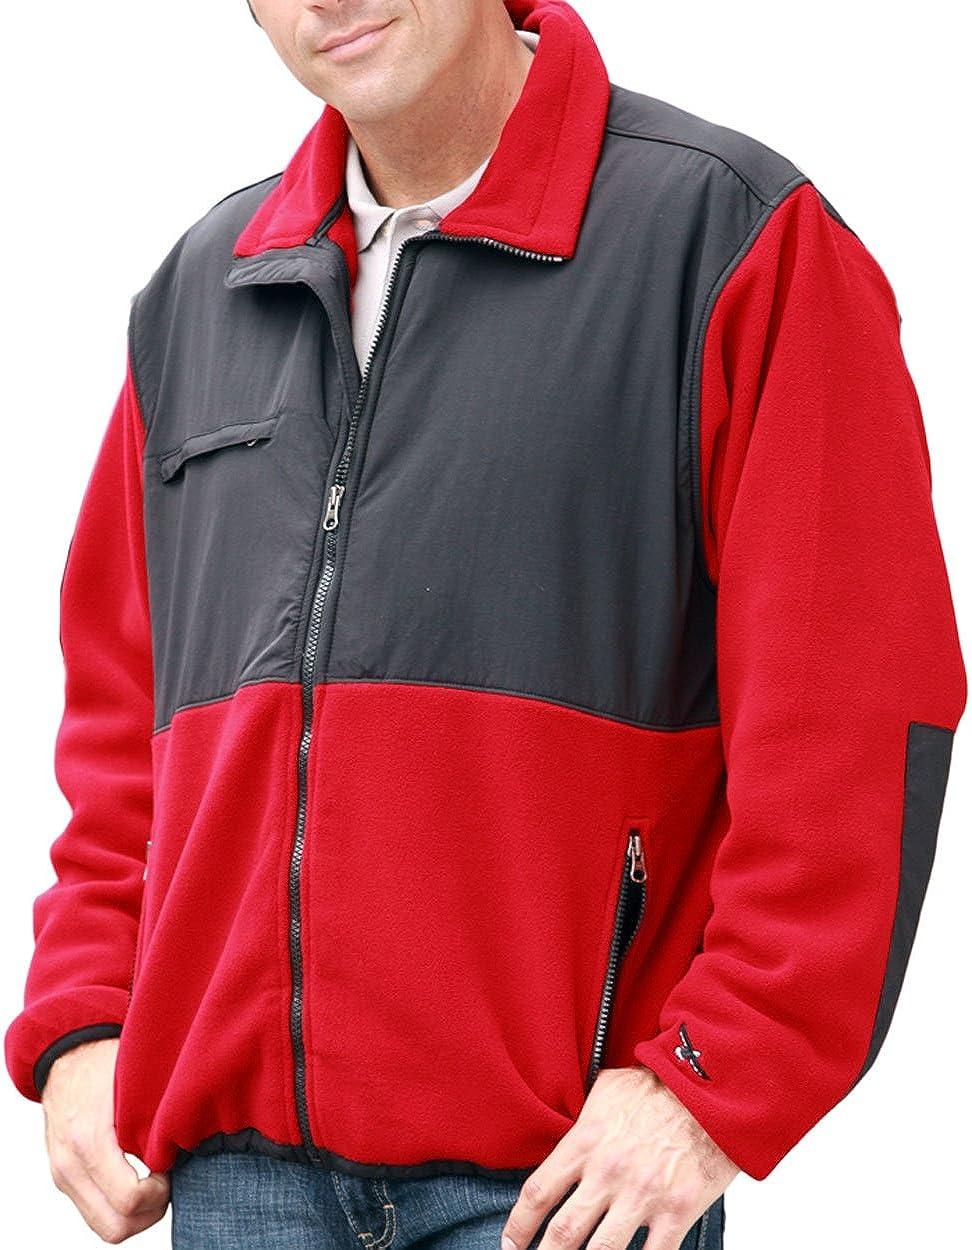 Bg-9950 5XL-REG, POLAR RED Mens Color Block Jacket